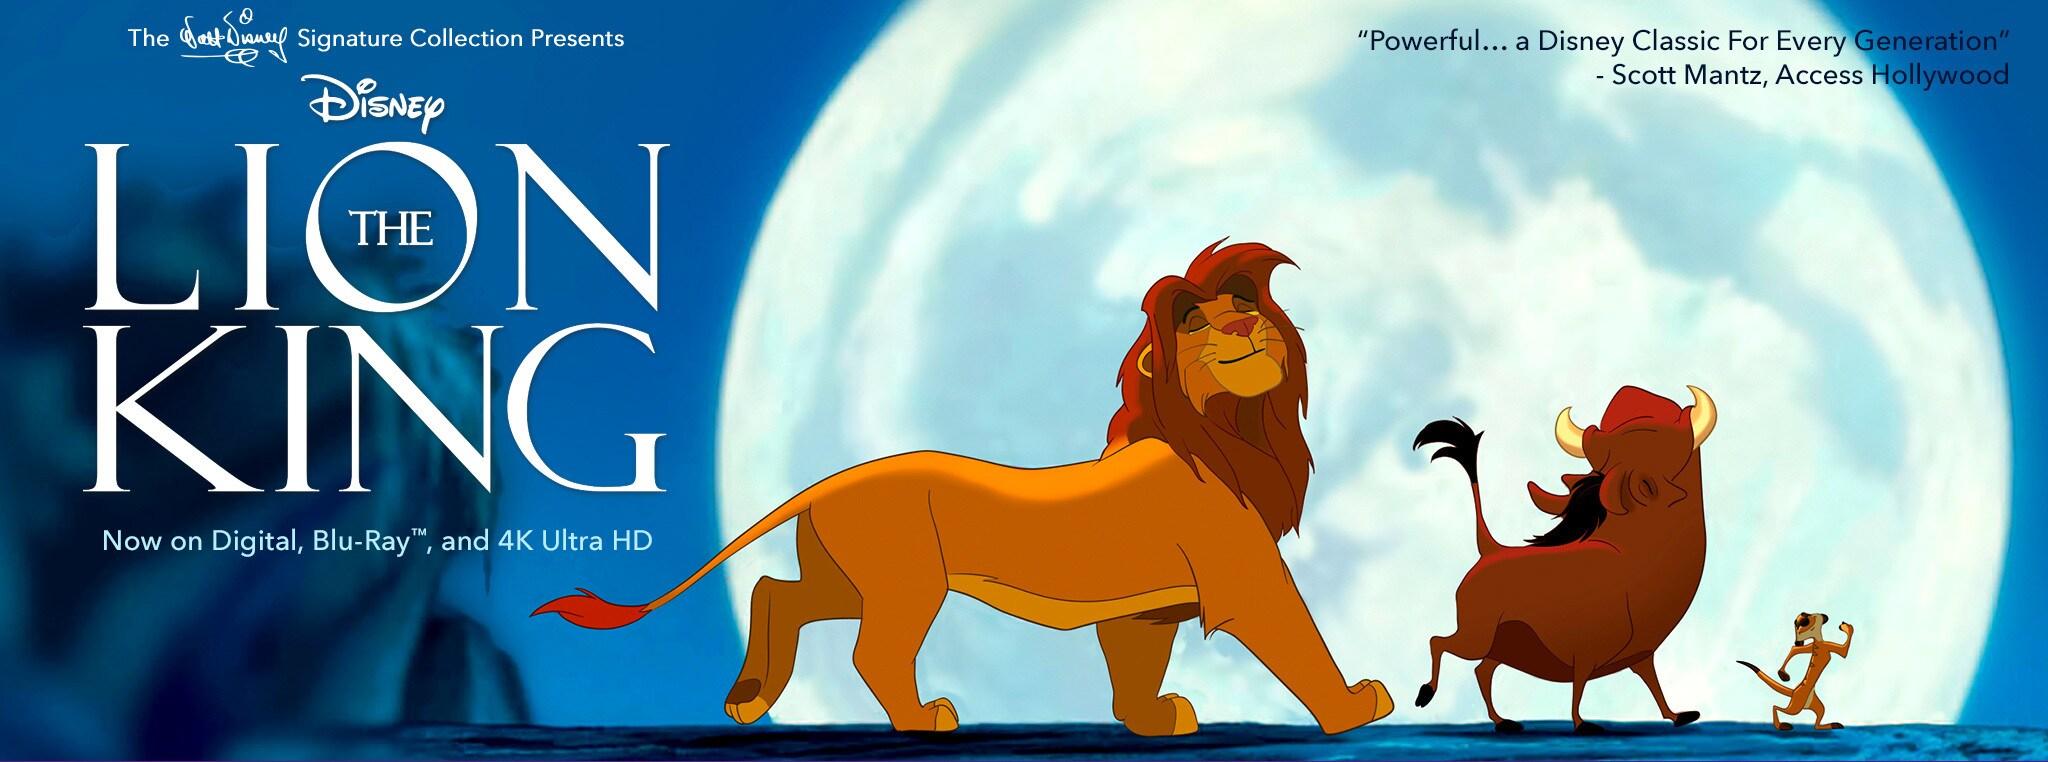 the lion king disney movies